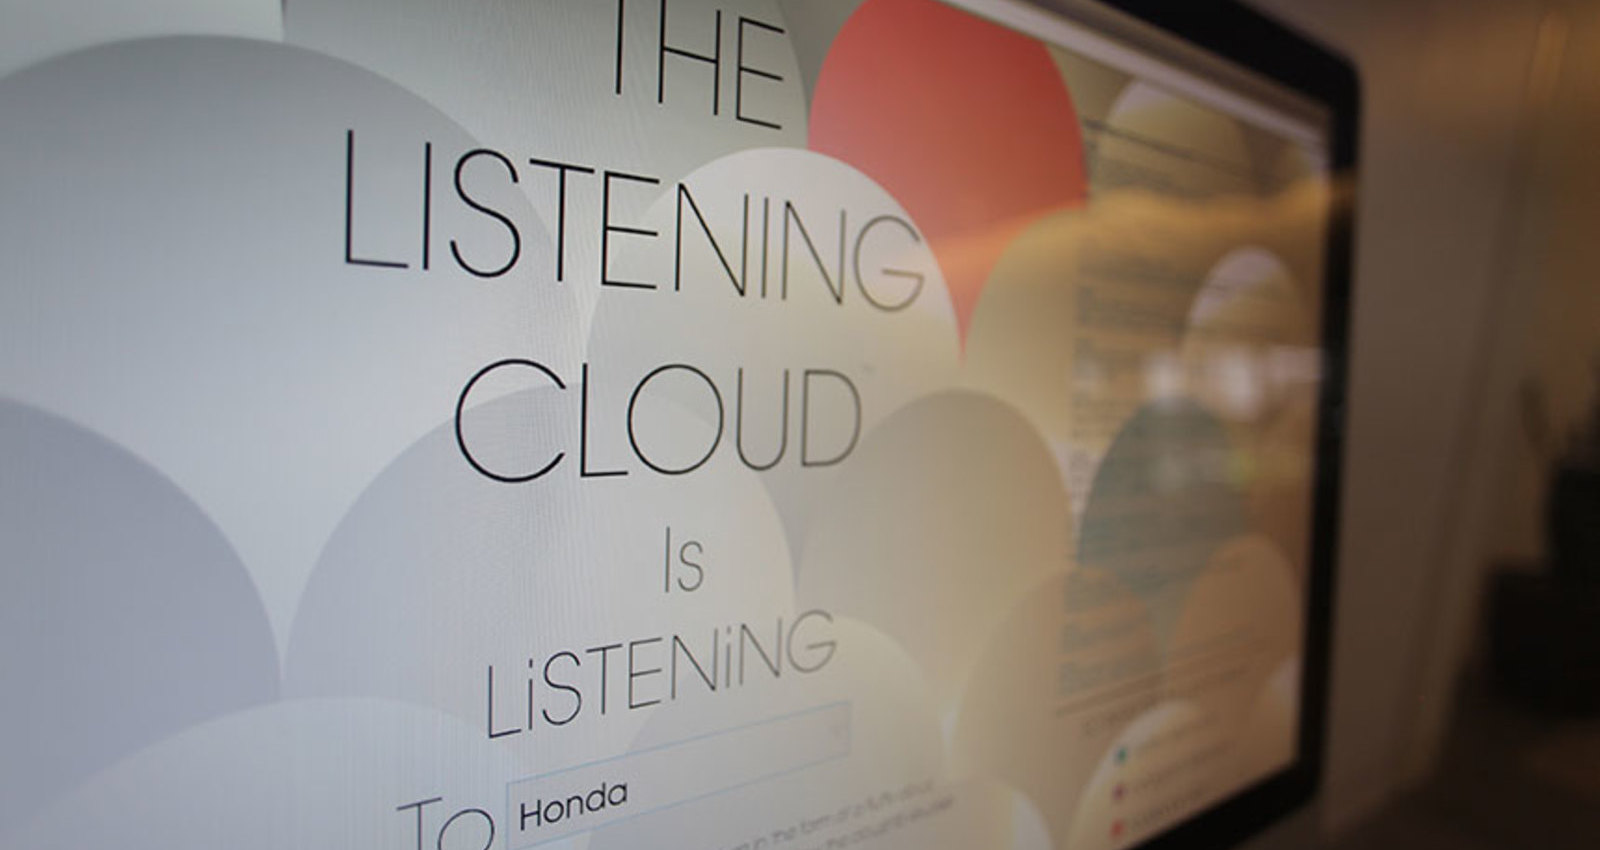 The Listening Cloud